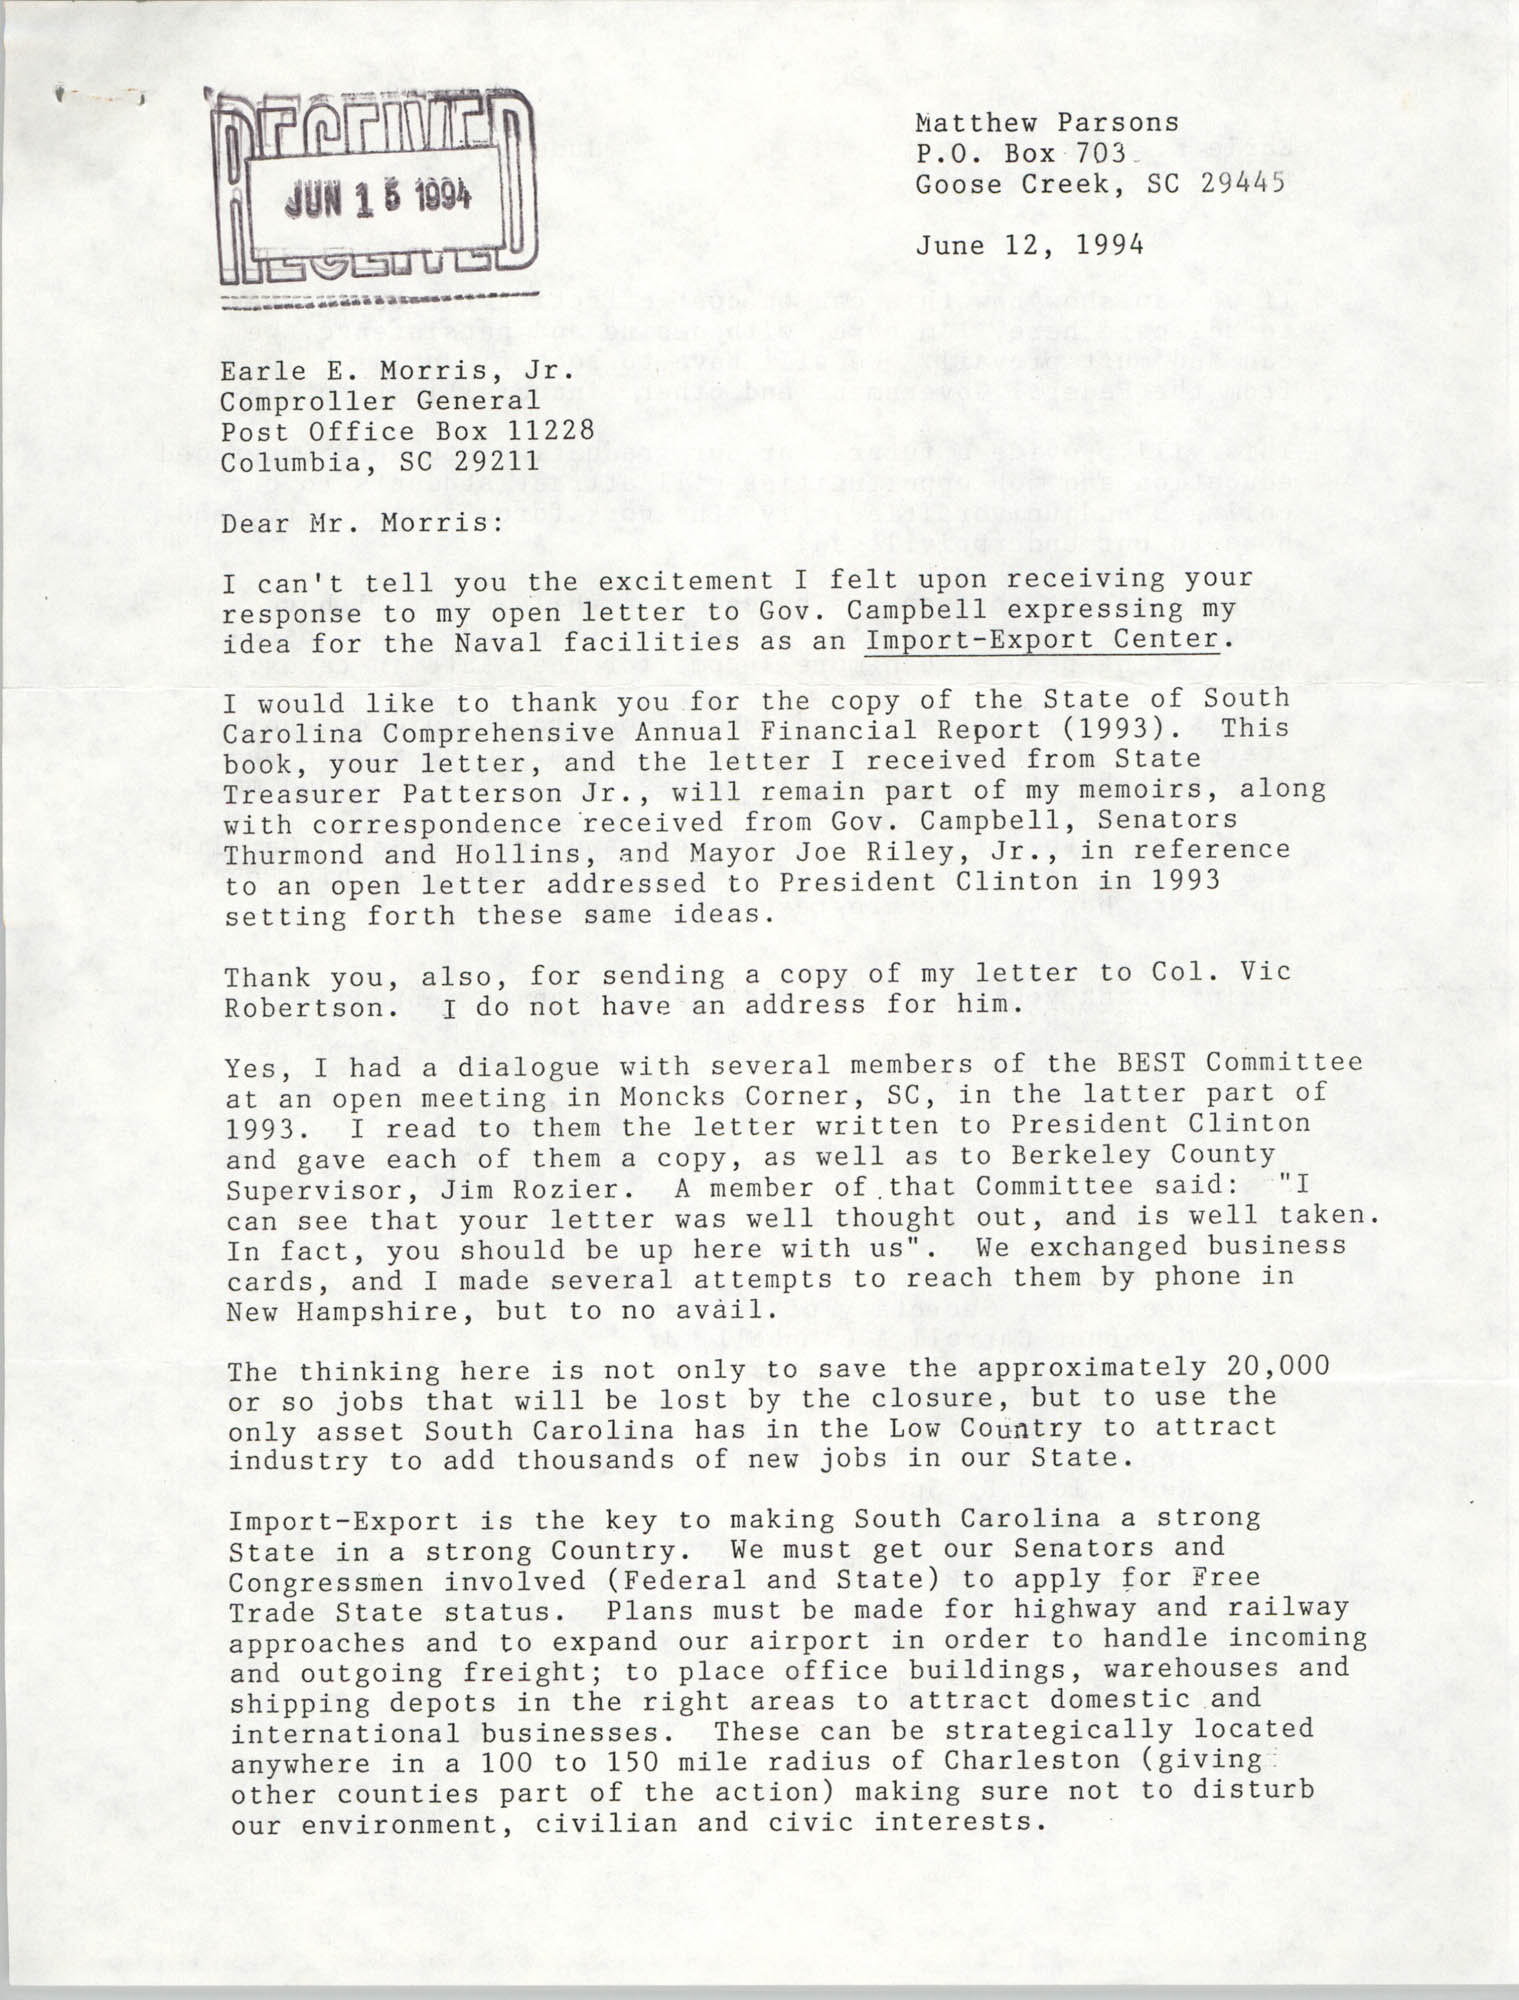 Letter from Matthew Parsons to Earle E. Morris, Jr., June 12, 1994